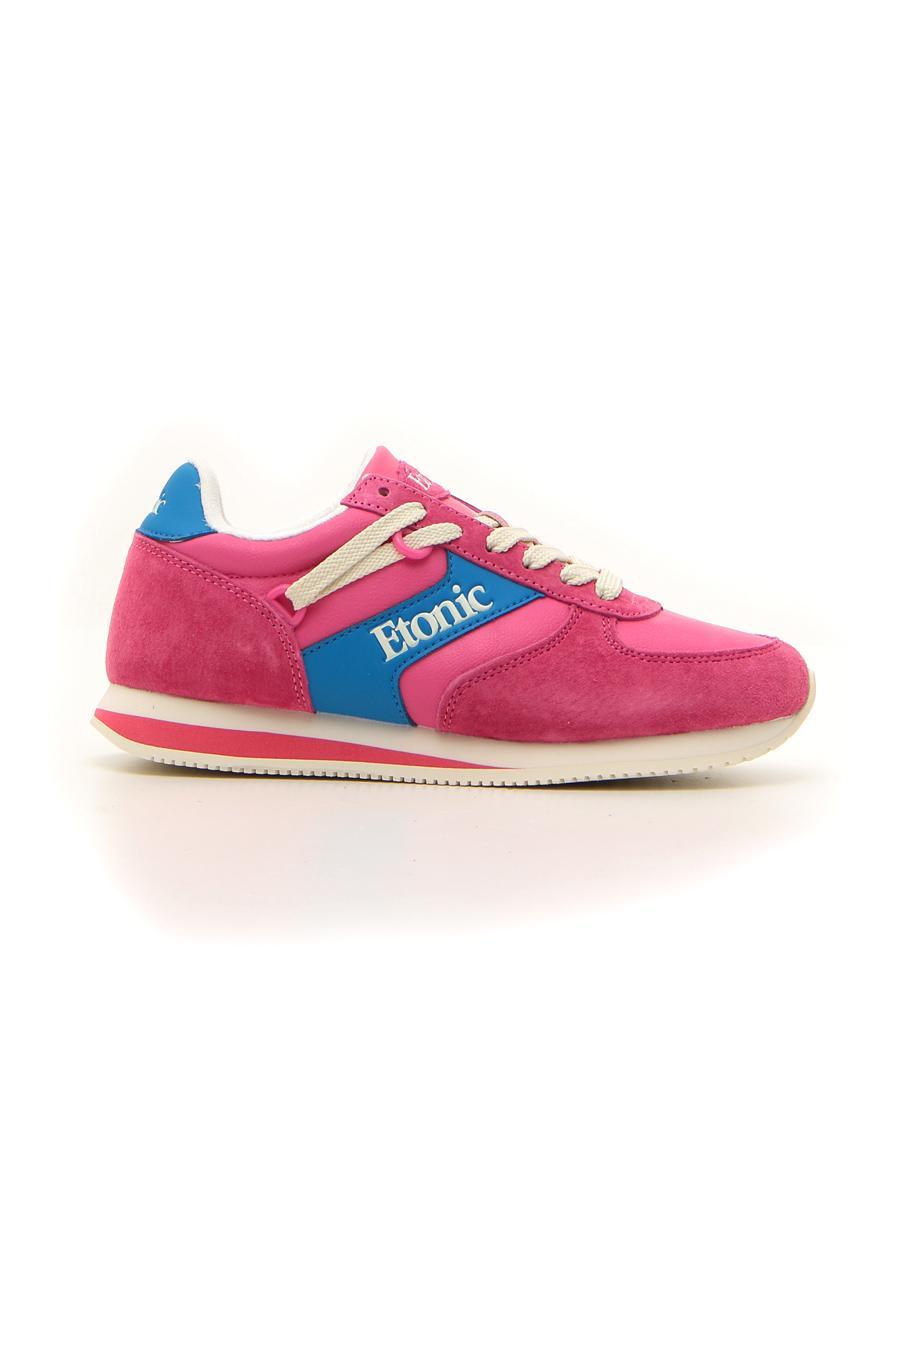 SNEAKERS donna rosa ETONIC 20407   Pittarello